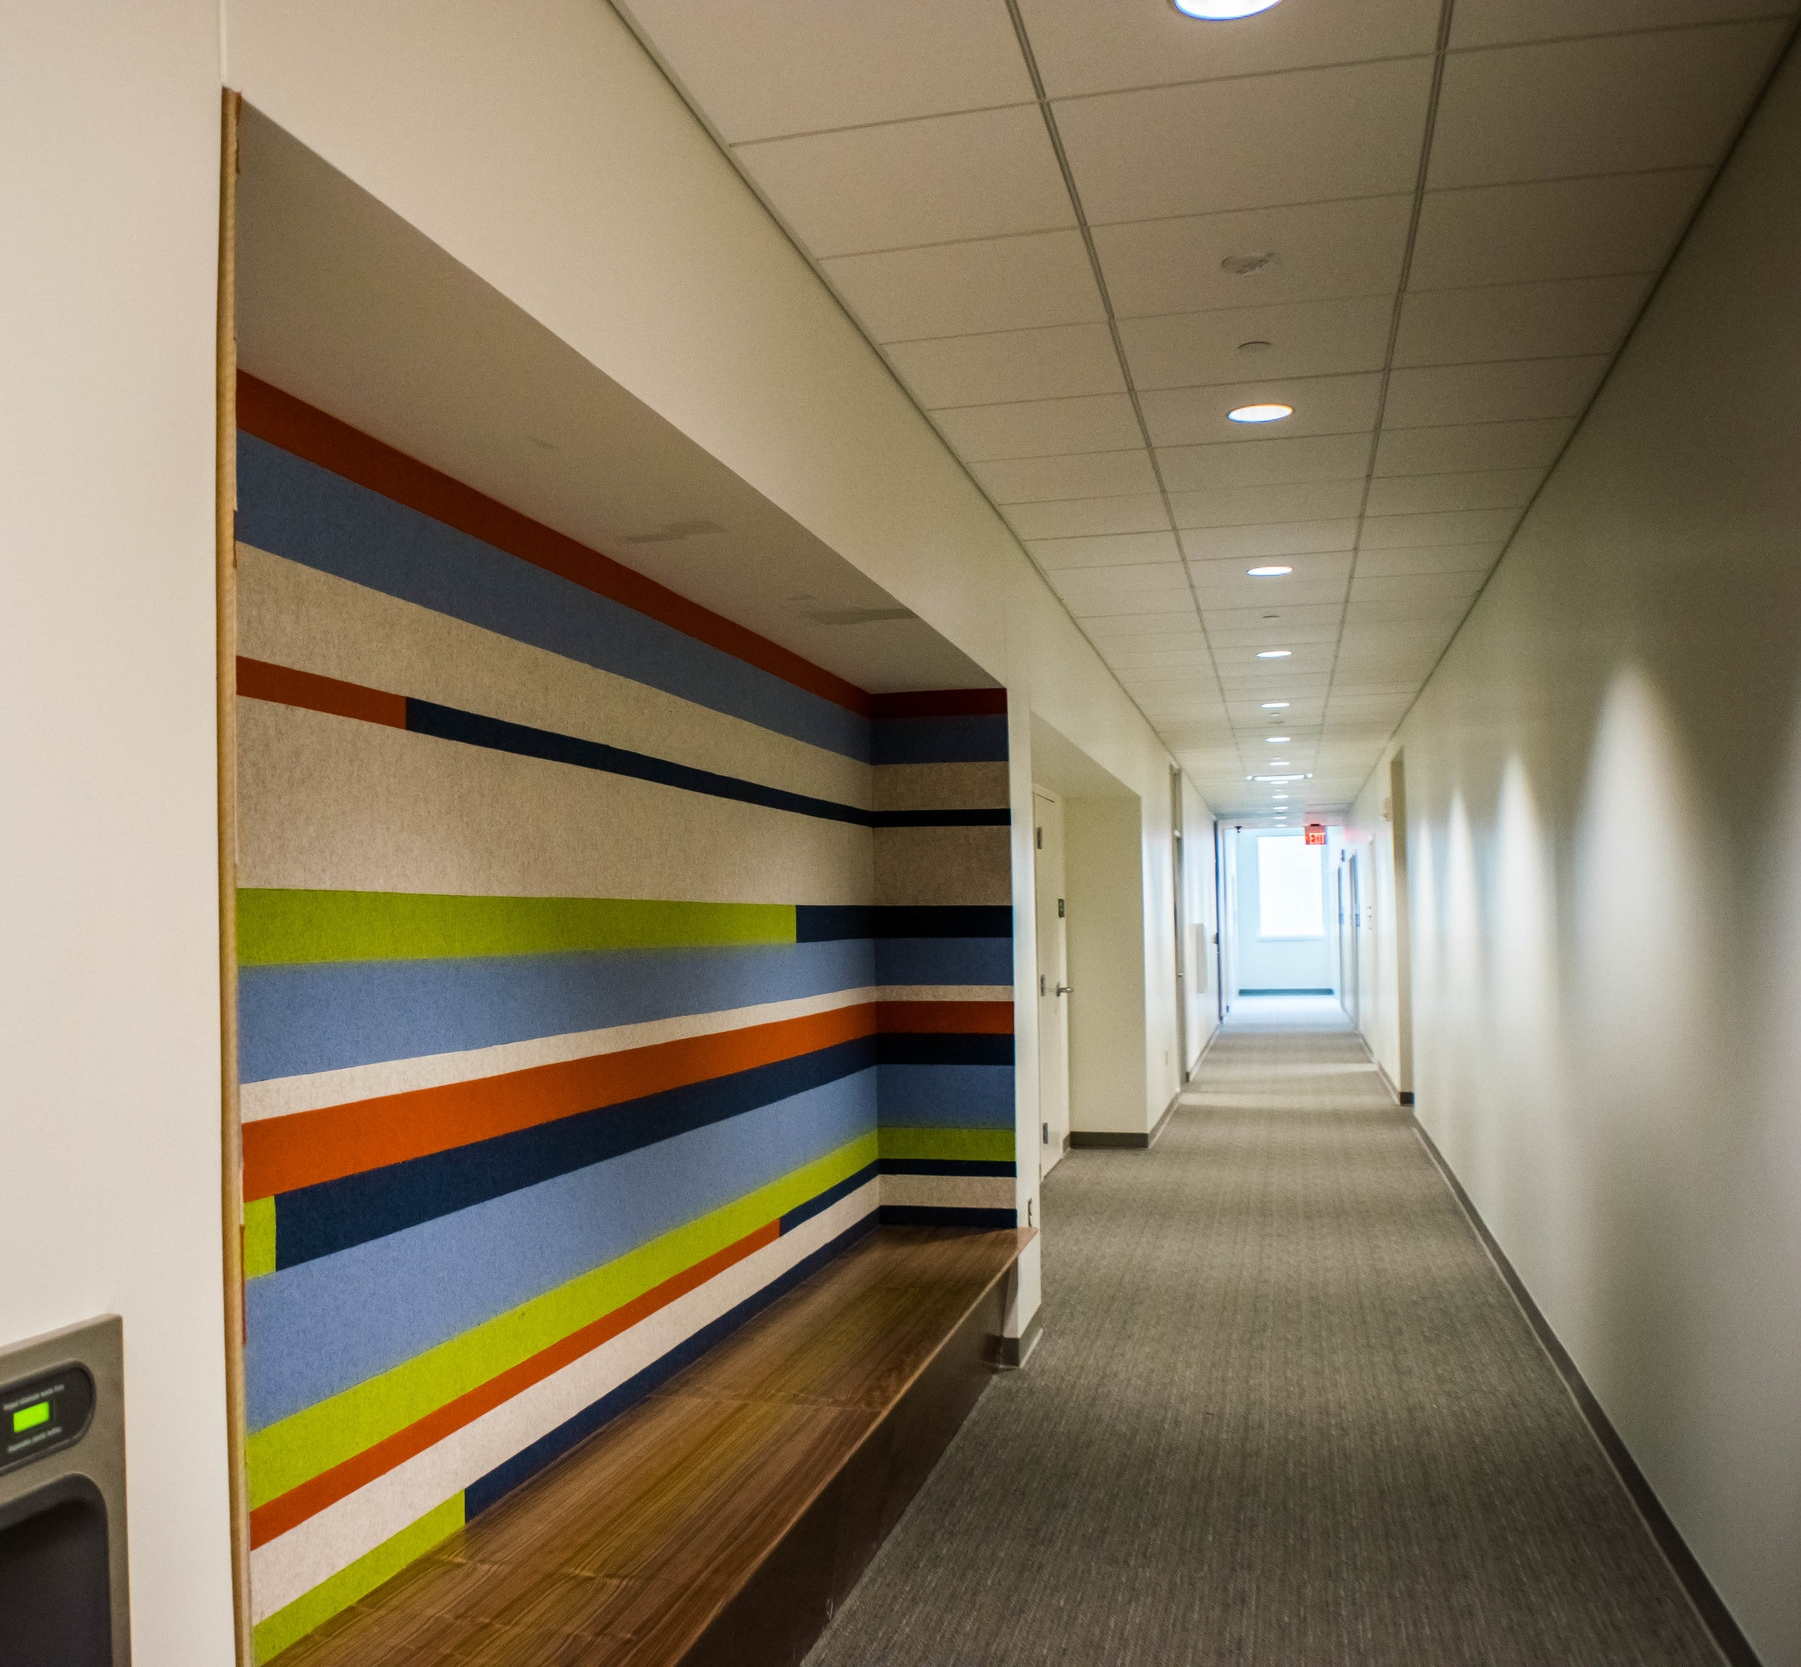 JMU East Tower (1st Floor Corridor)